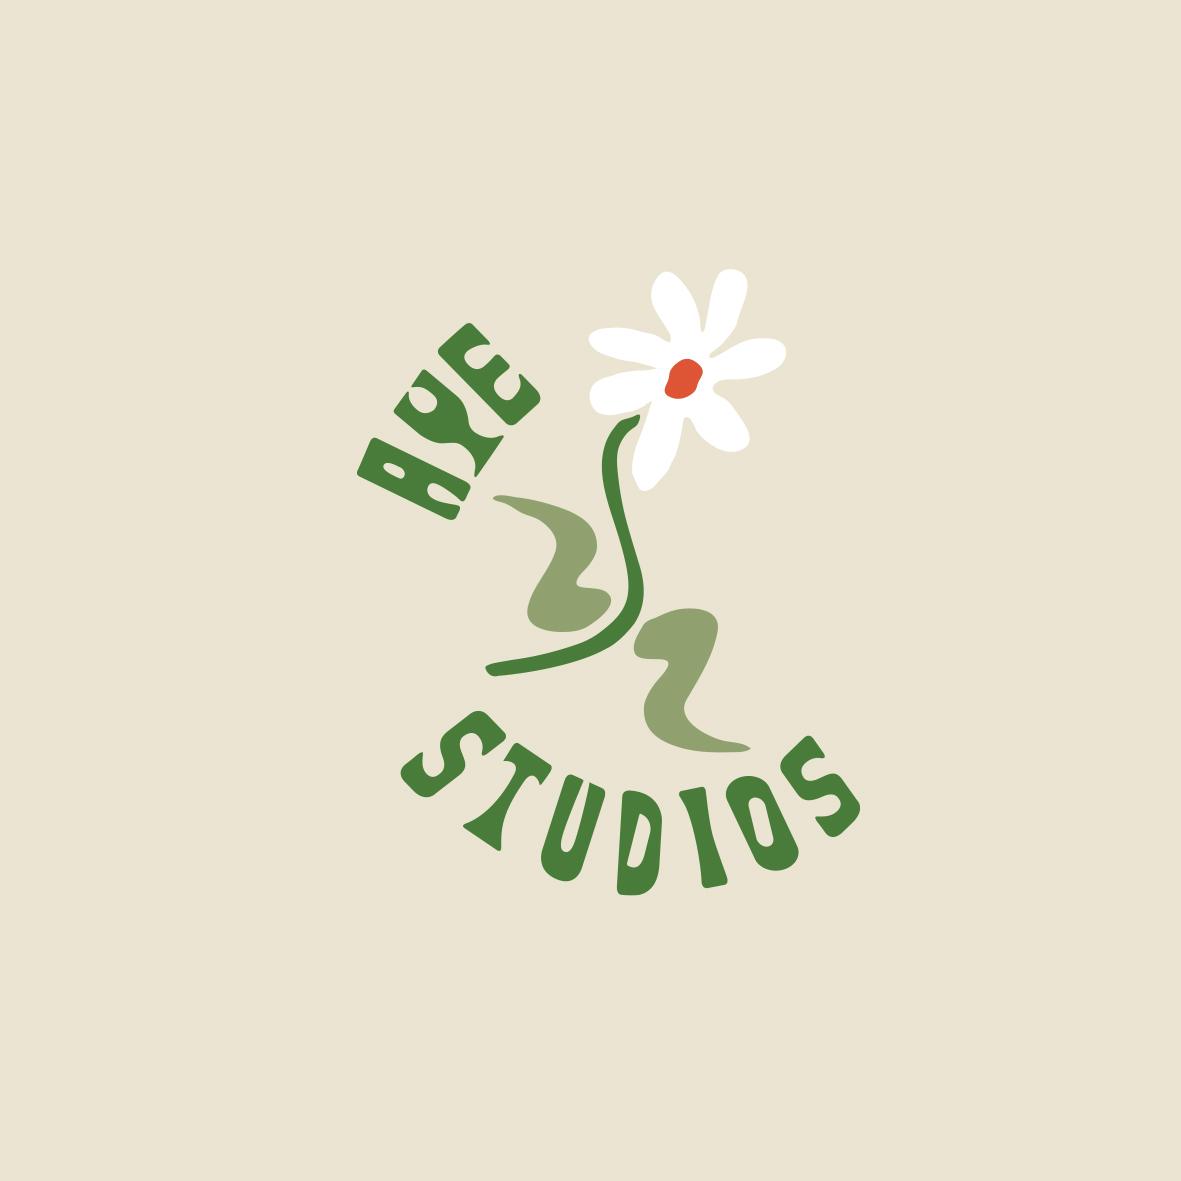 Aye Studios Identity and Illustration by Designer Max Blackmore